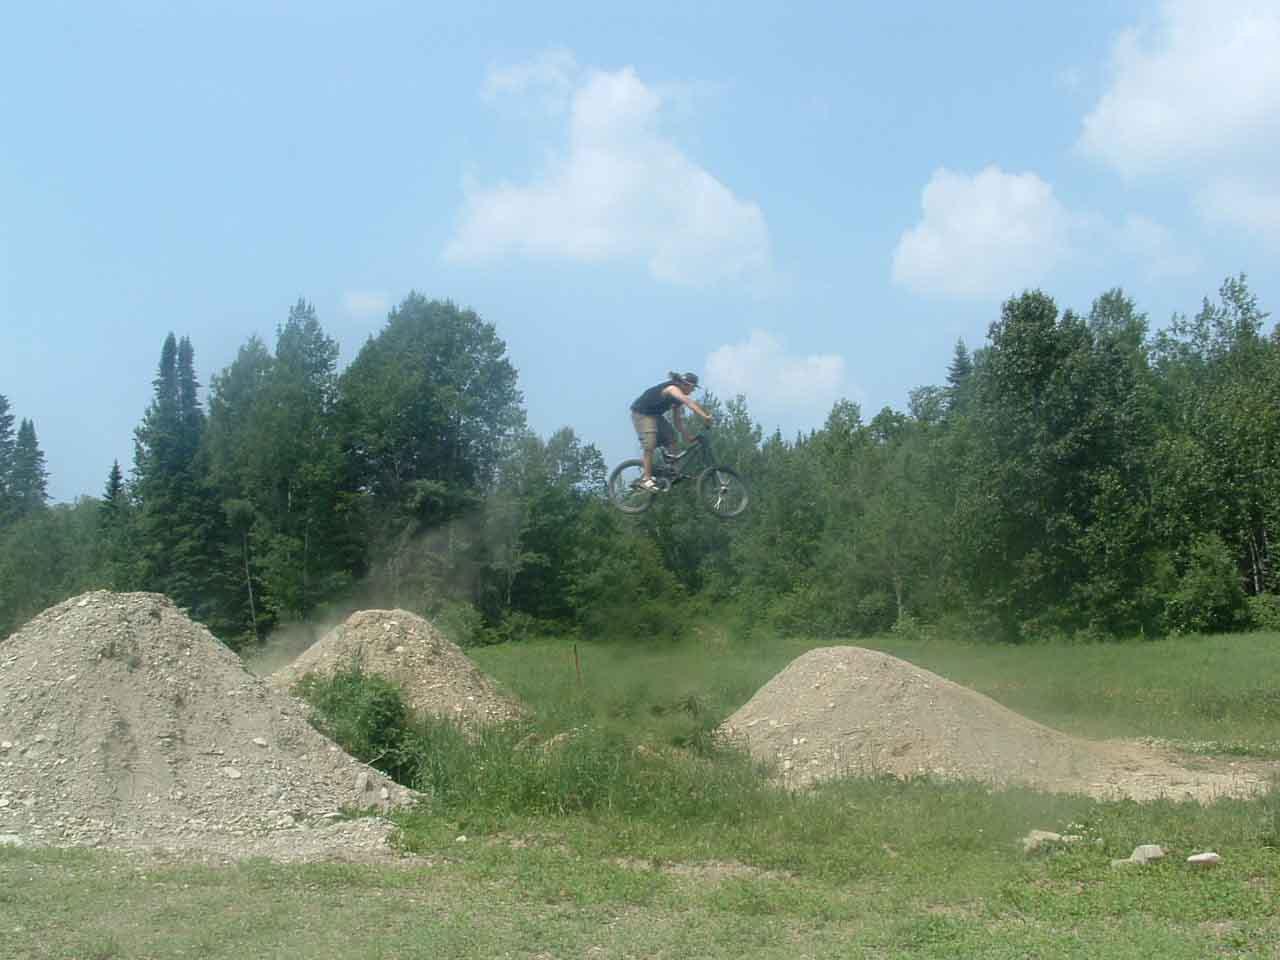 Jump last summer i gotta change it up